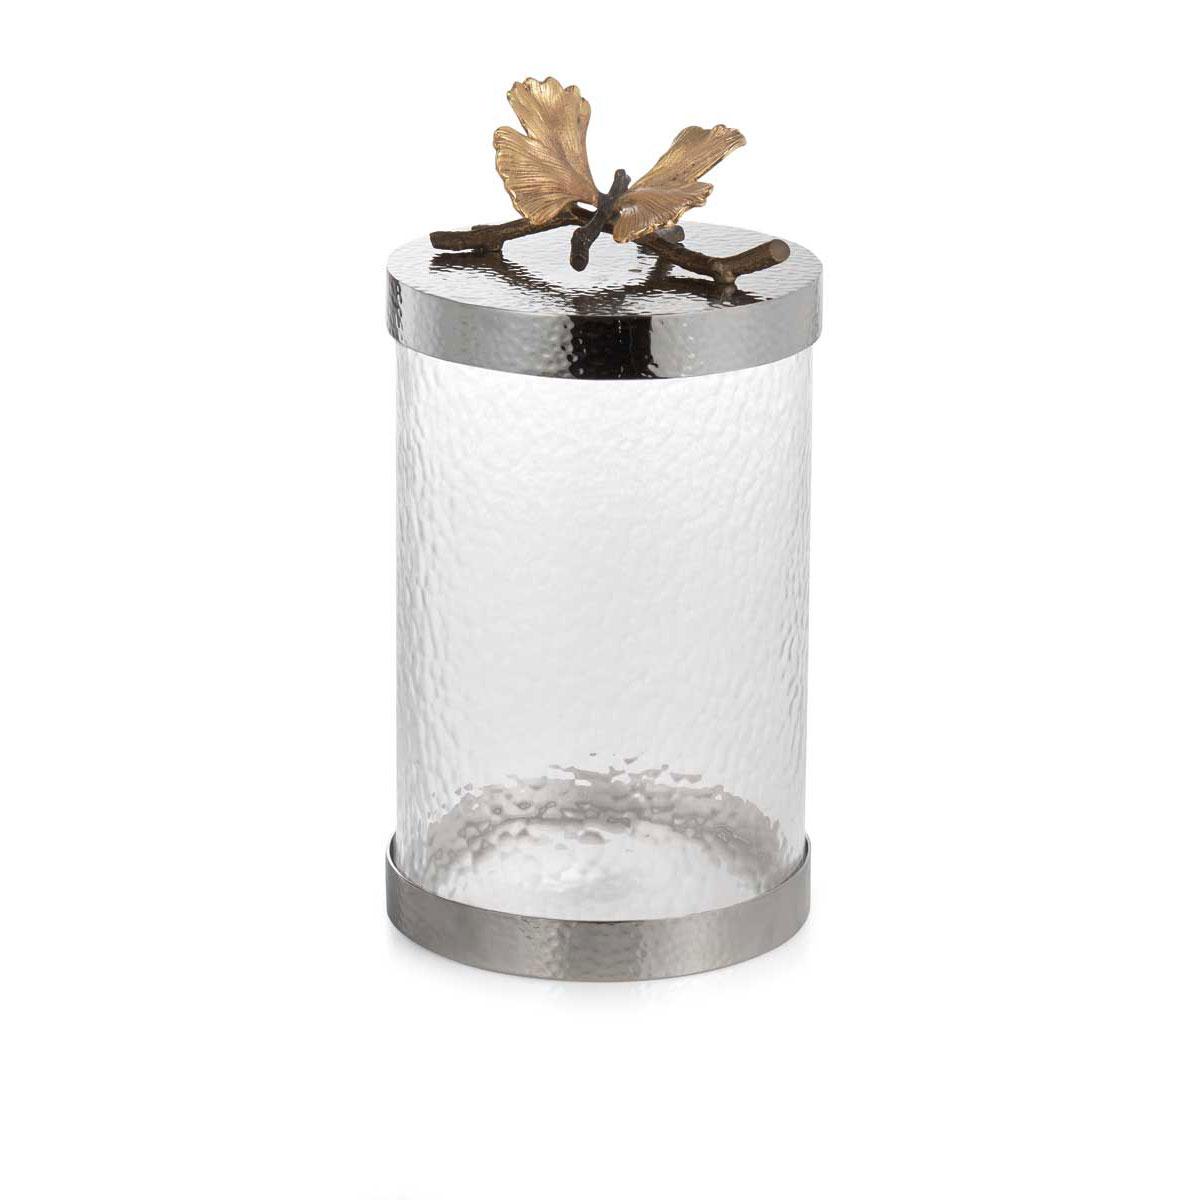 Michael Aram Butterfly Ginkgo Kitchen Canister, Medium